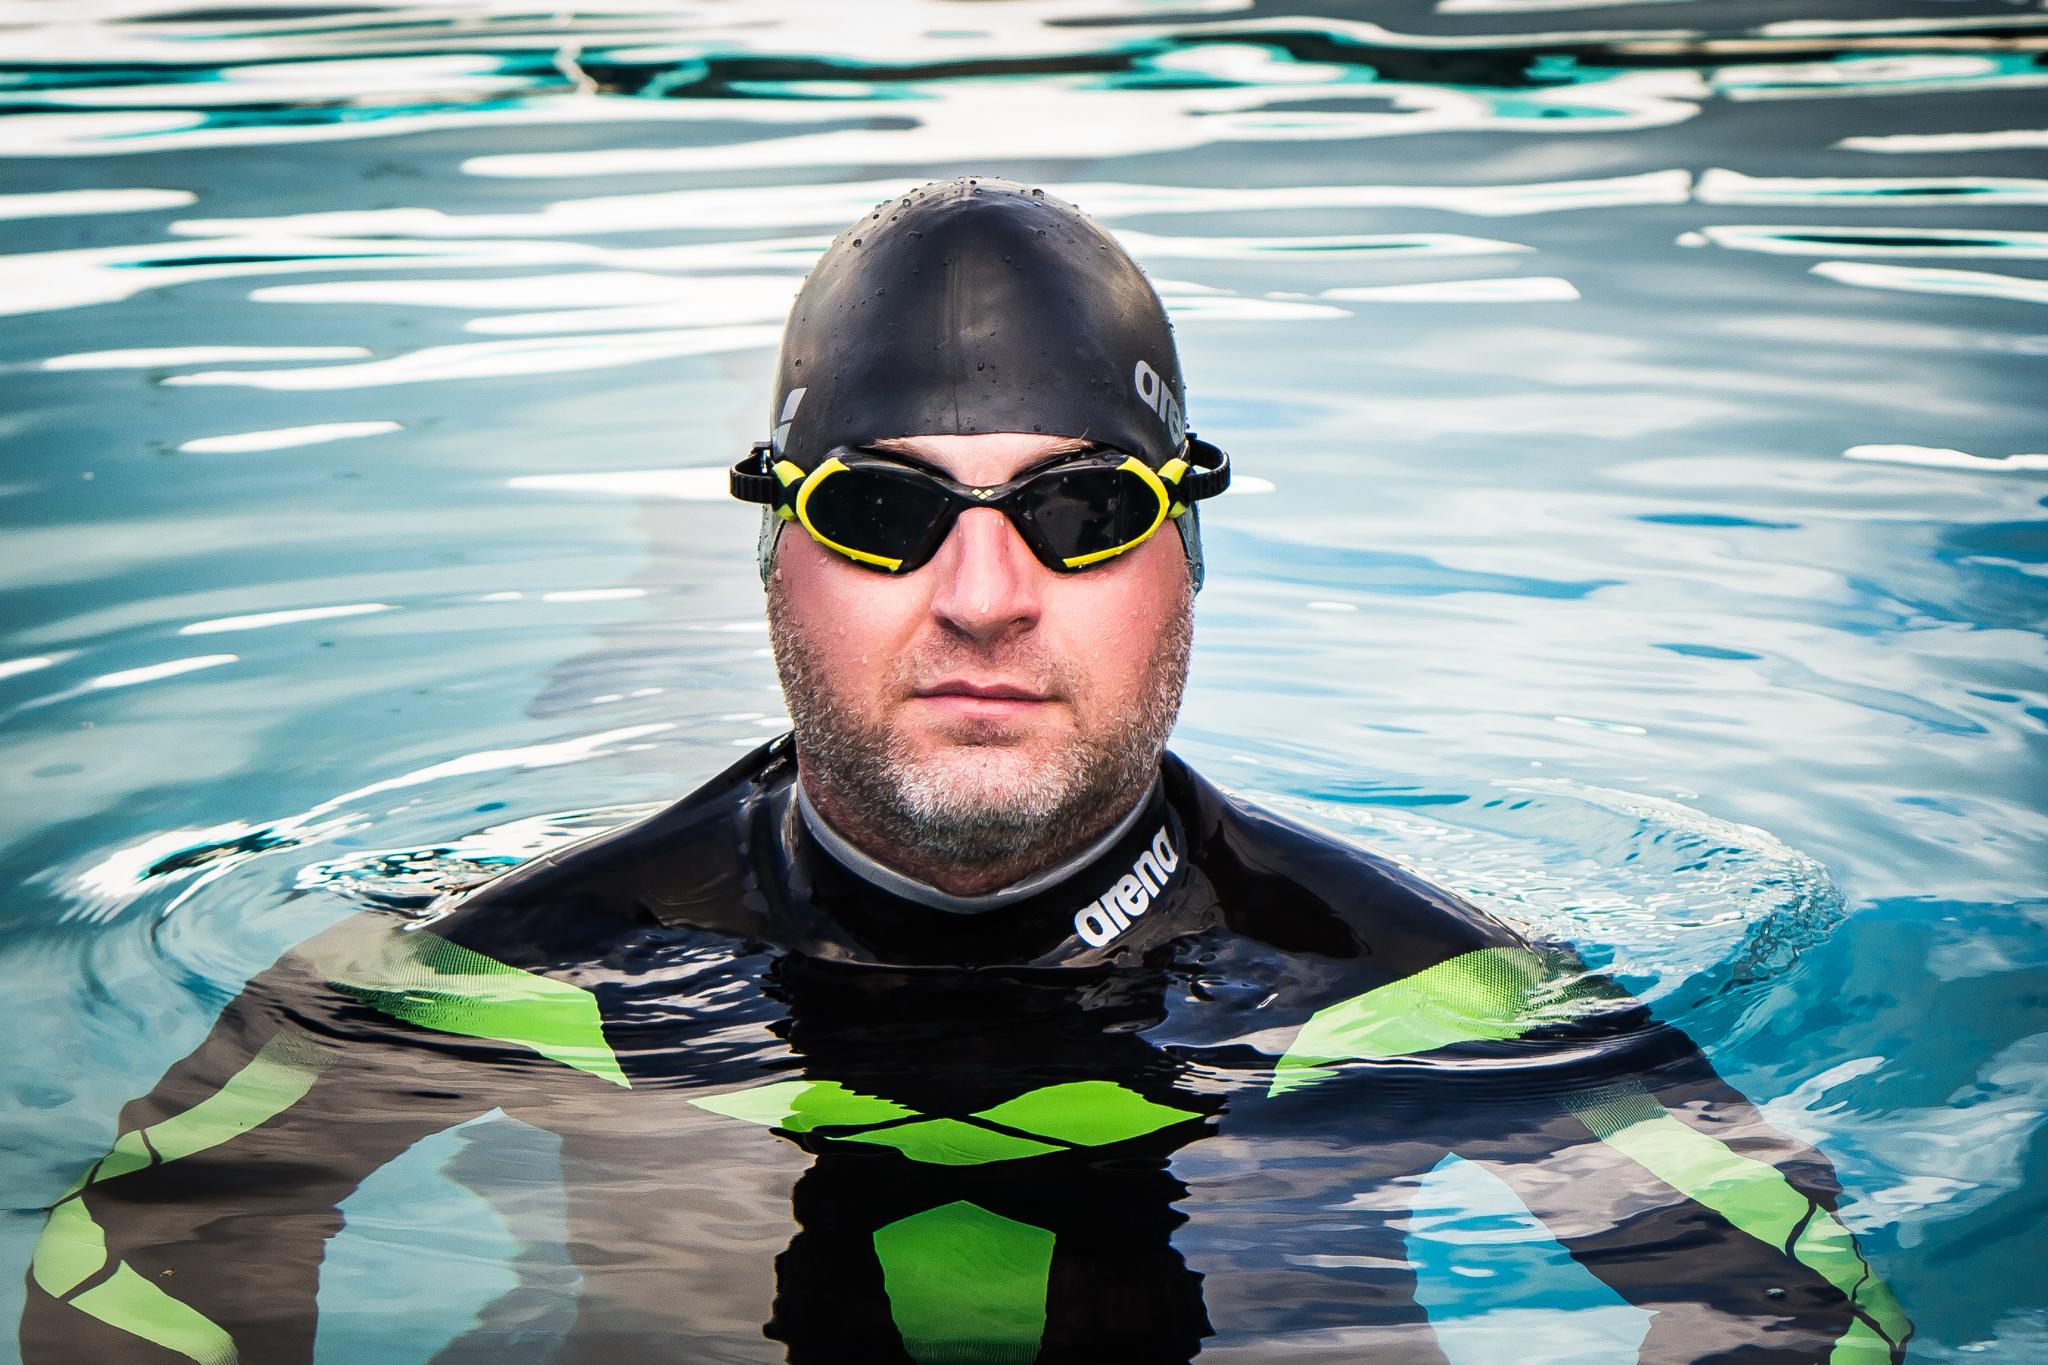 Palamedes PR promotes the 'Swim the Big Blue' expedition - Ben Hooper's record-breaking Atlantic swim